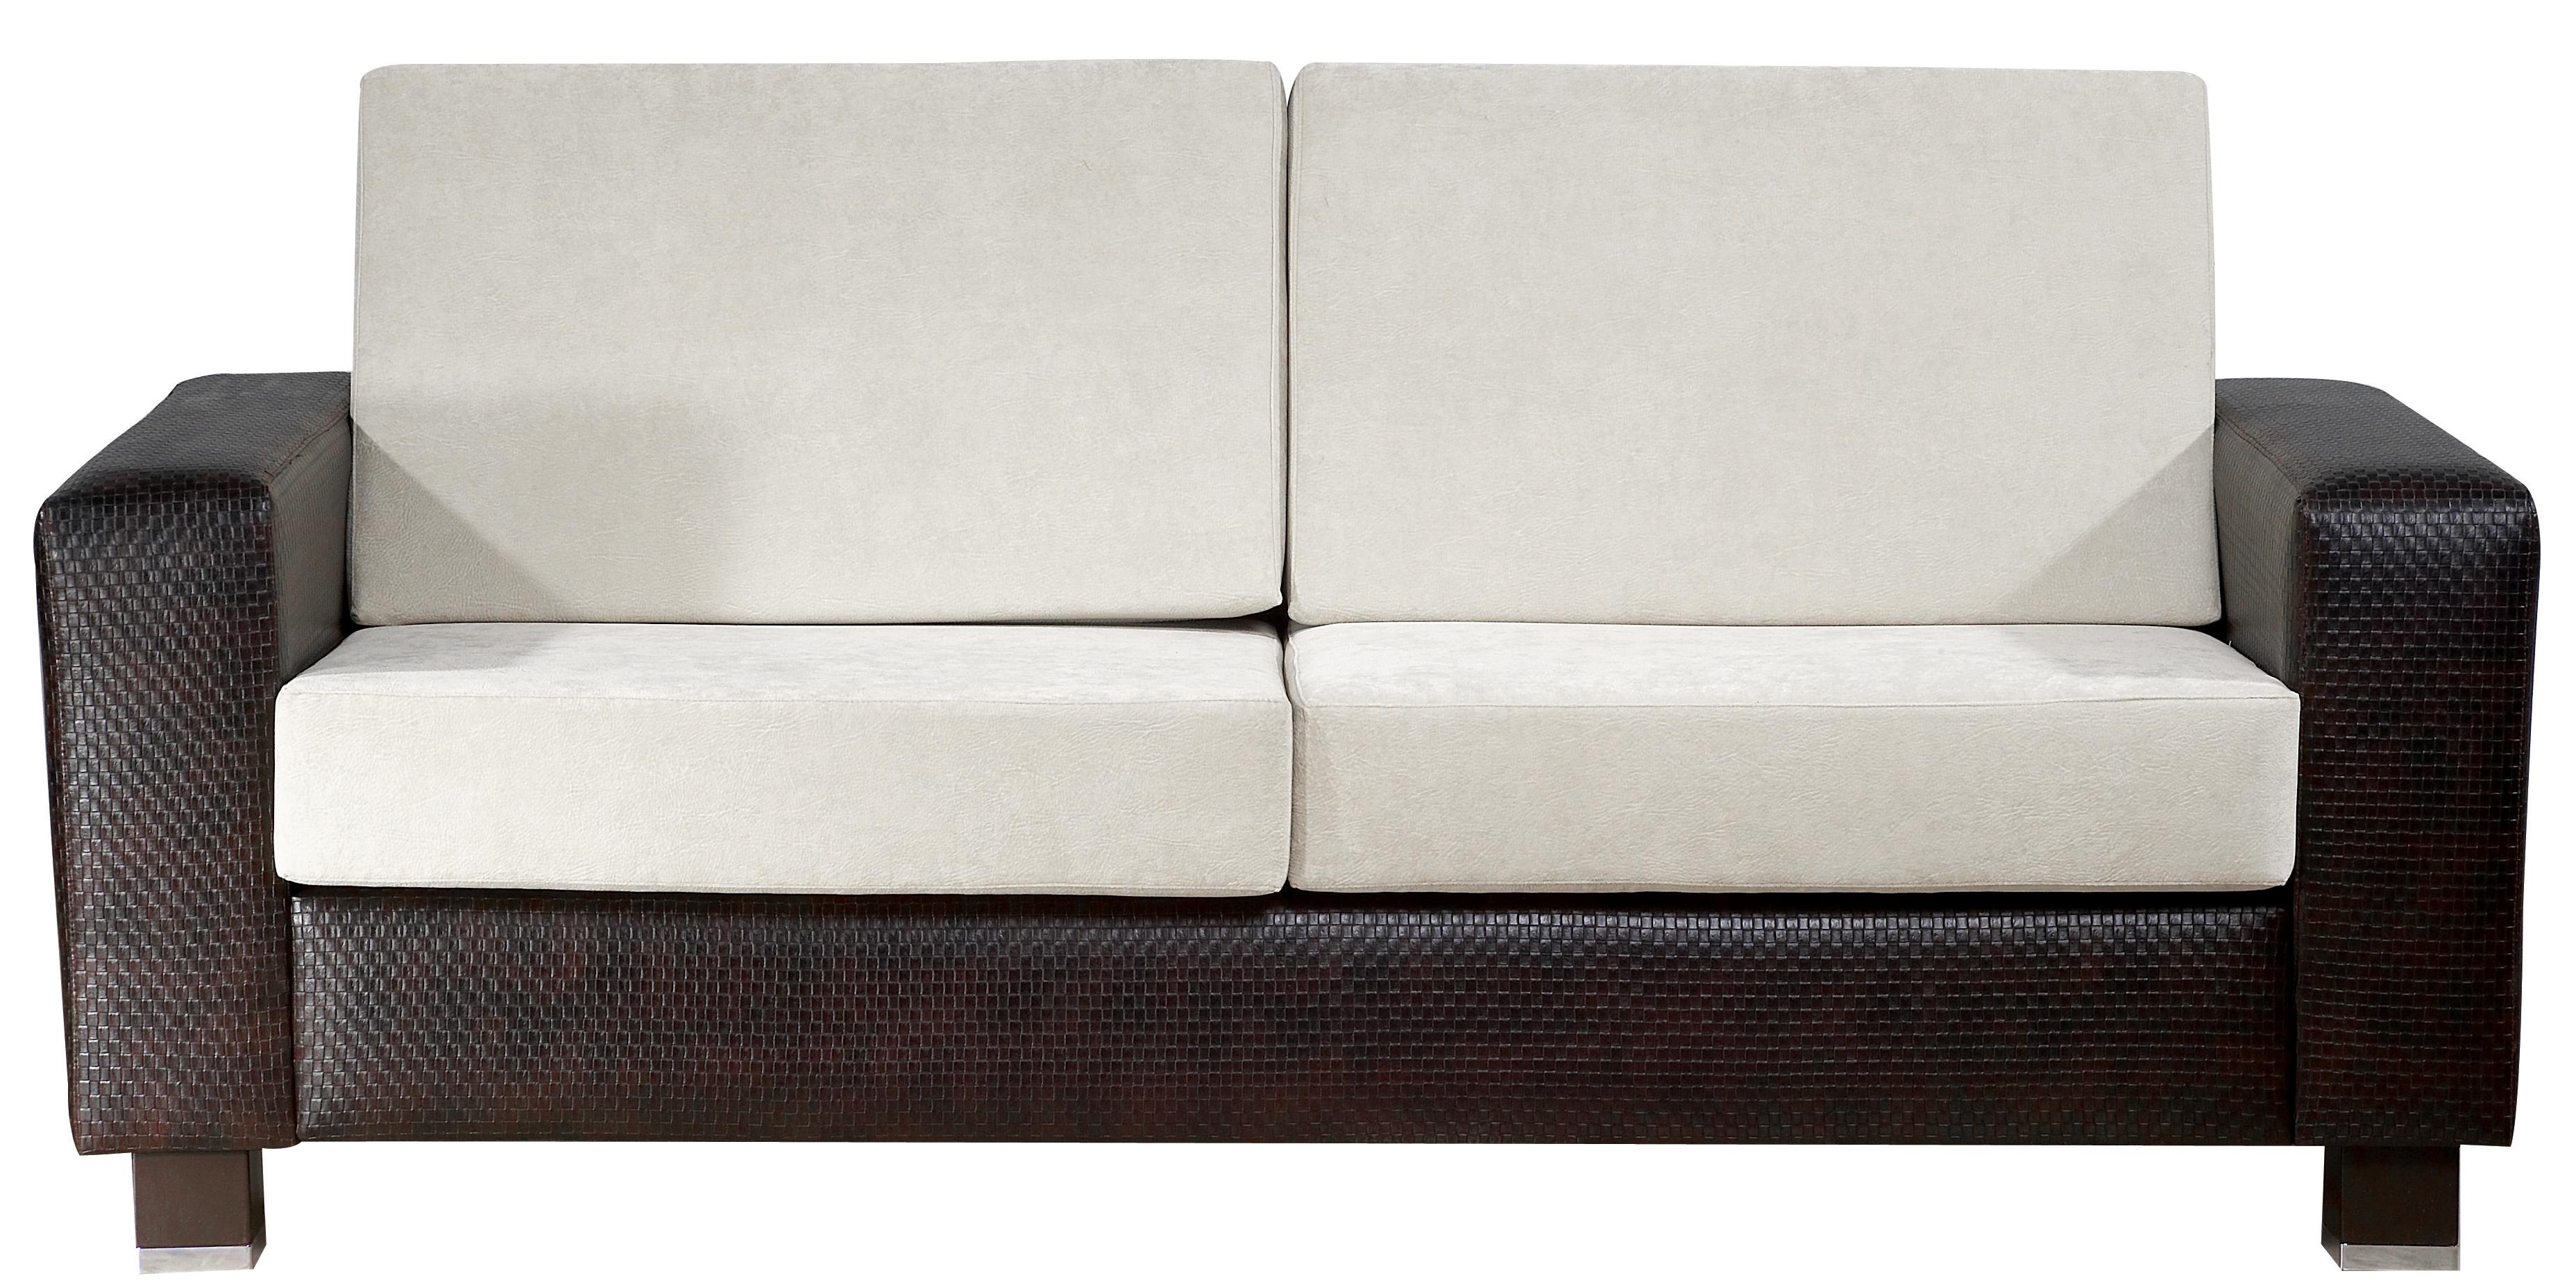 Furniture PNG - 26725